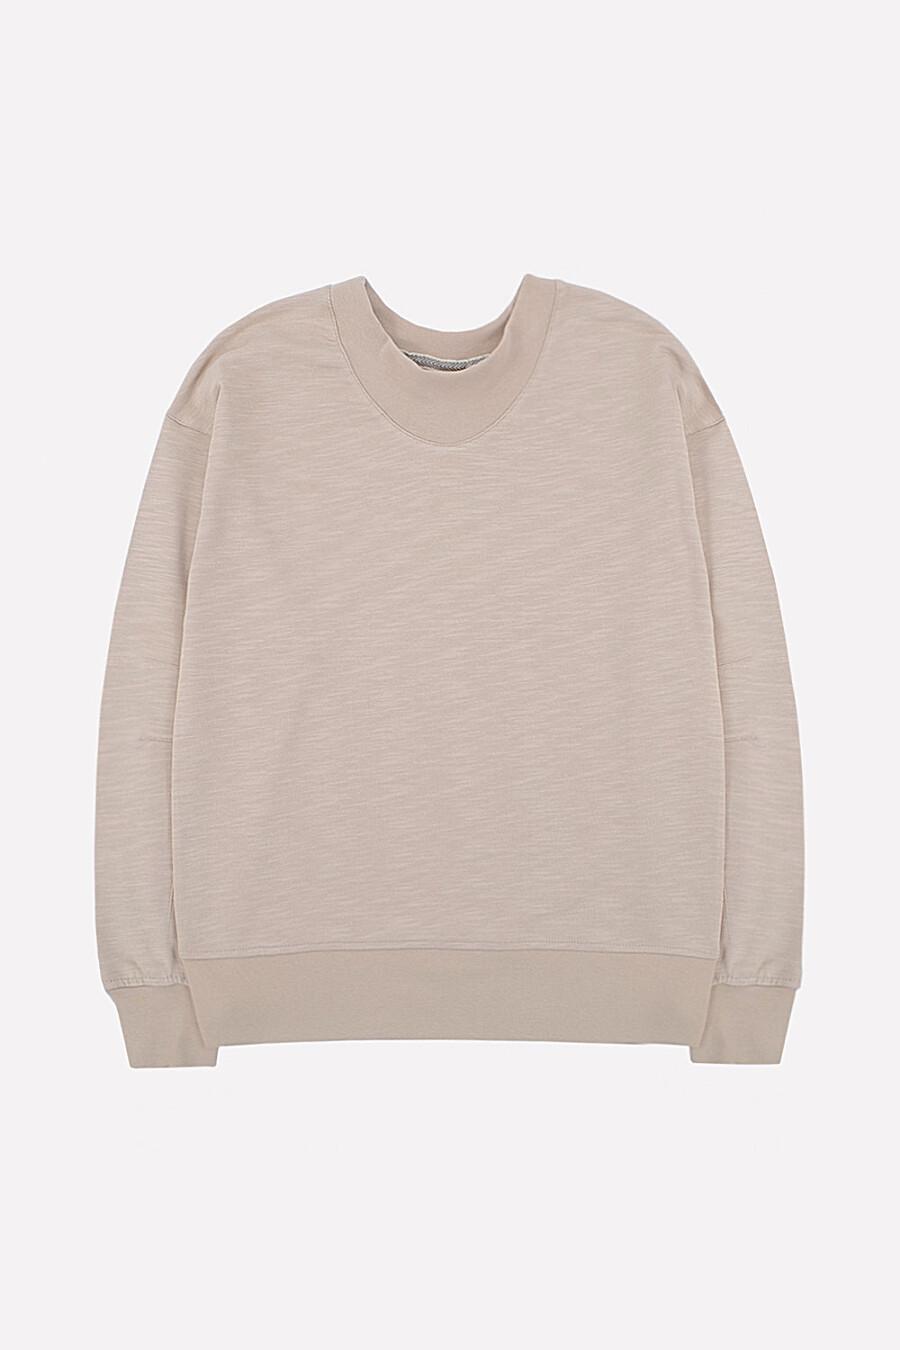 Джемпер TRIKOZZA (700718), купить в Moyo.moda